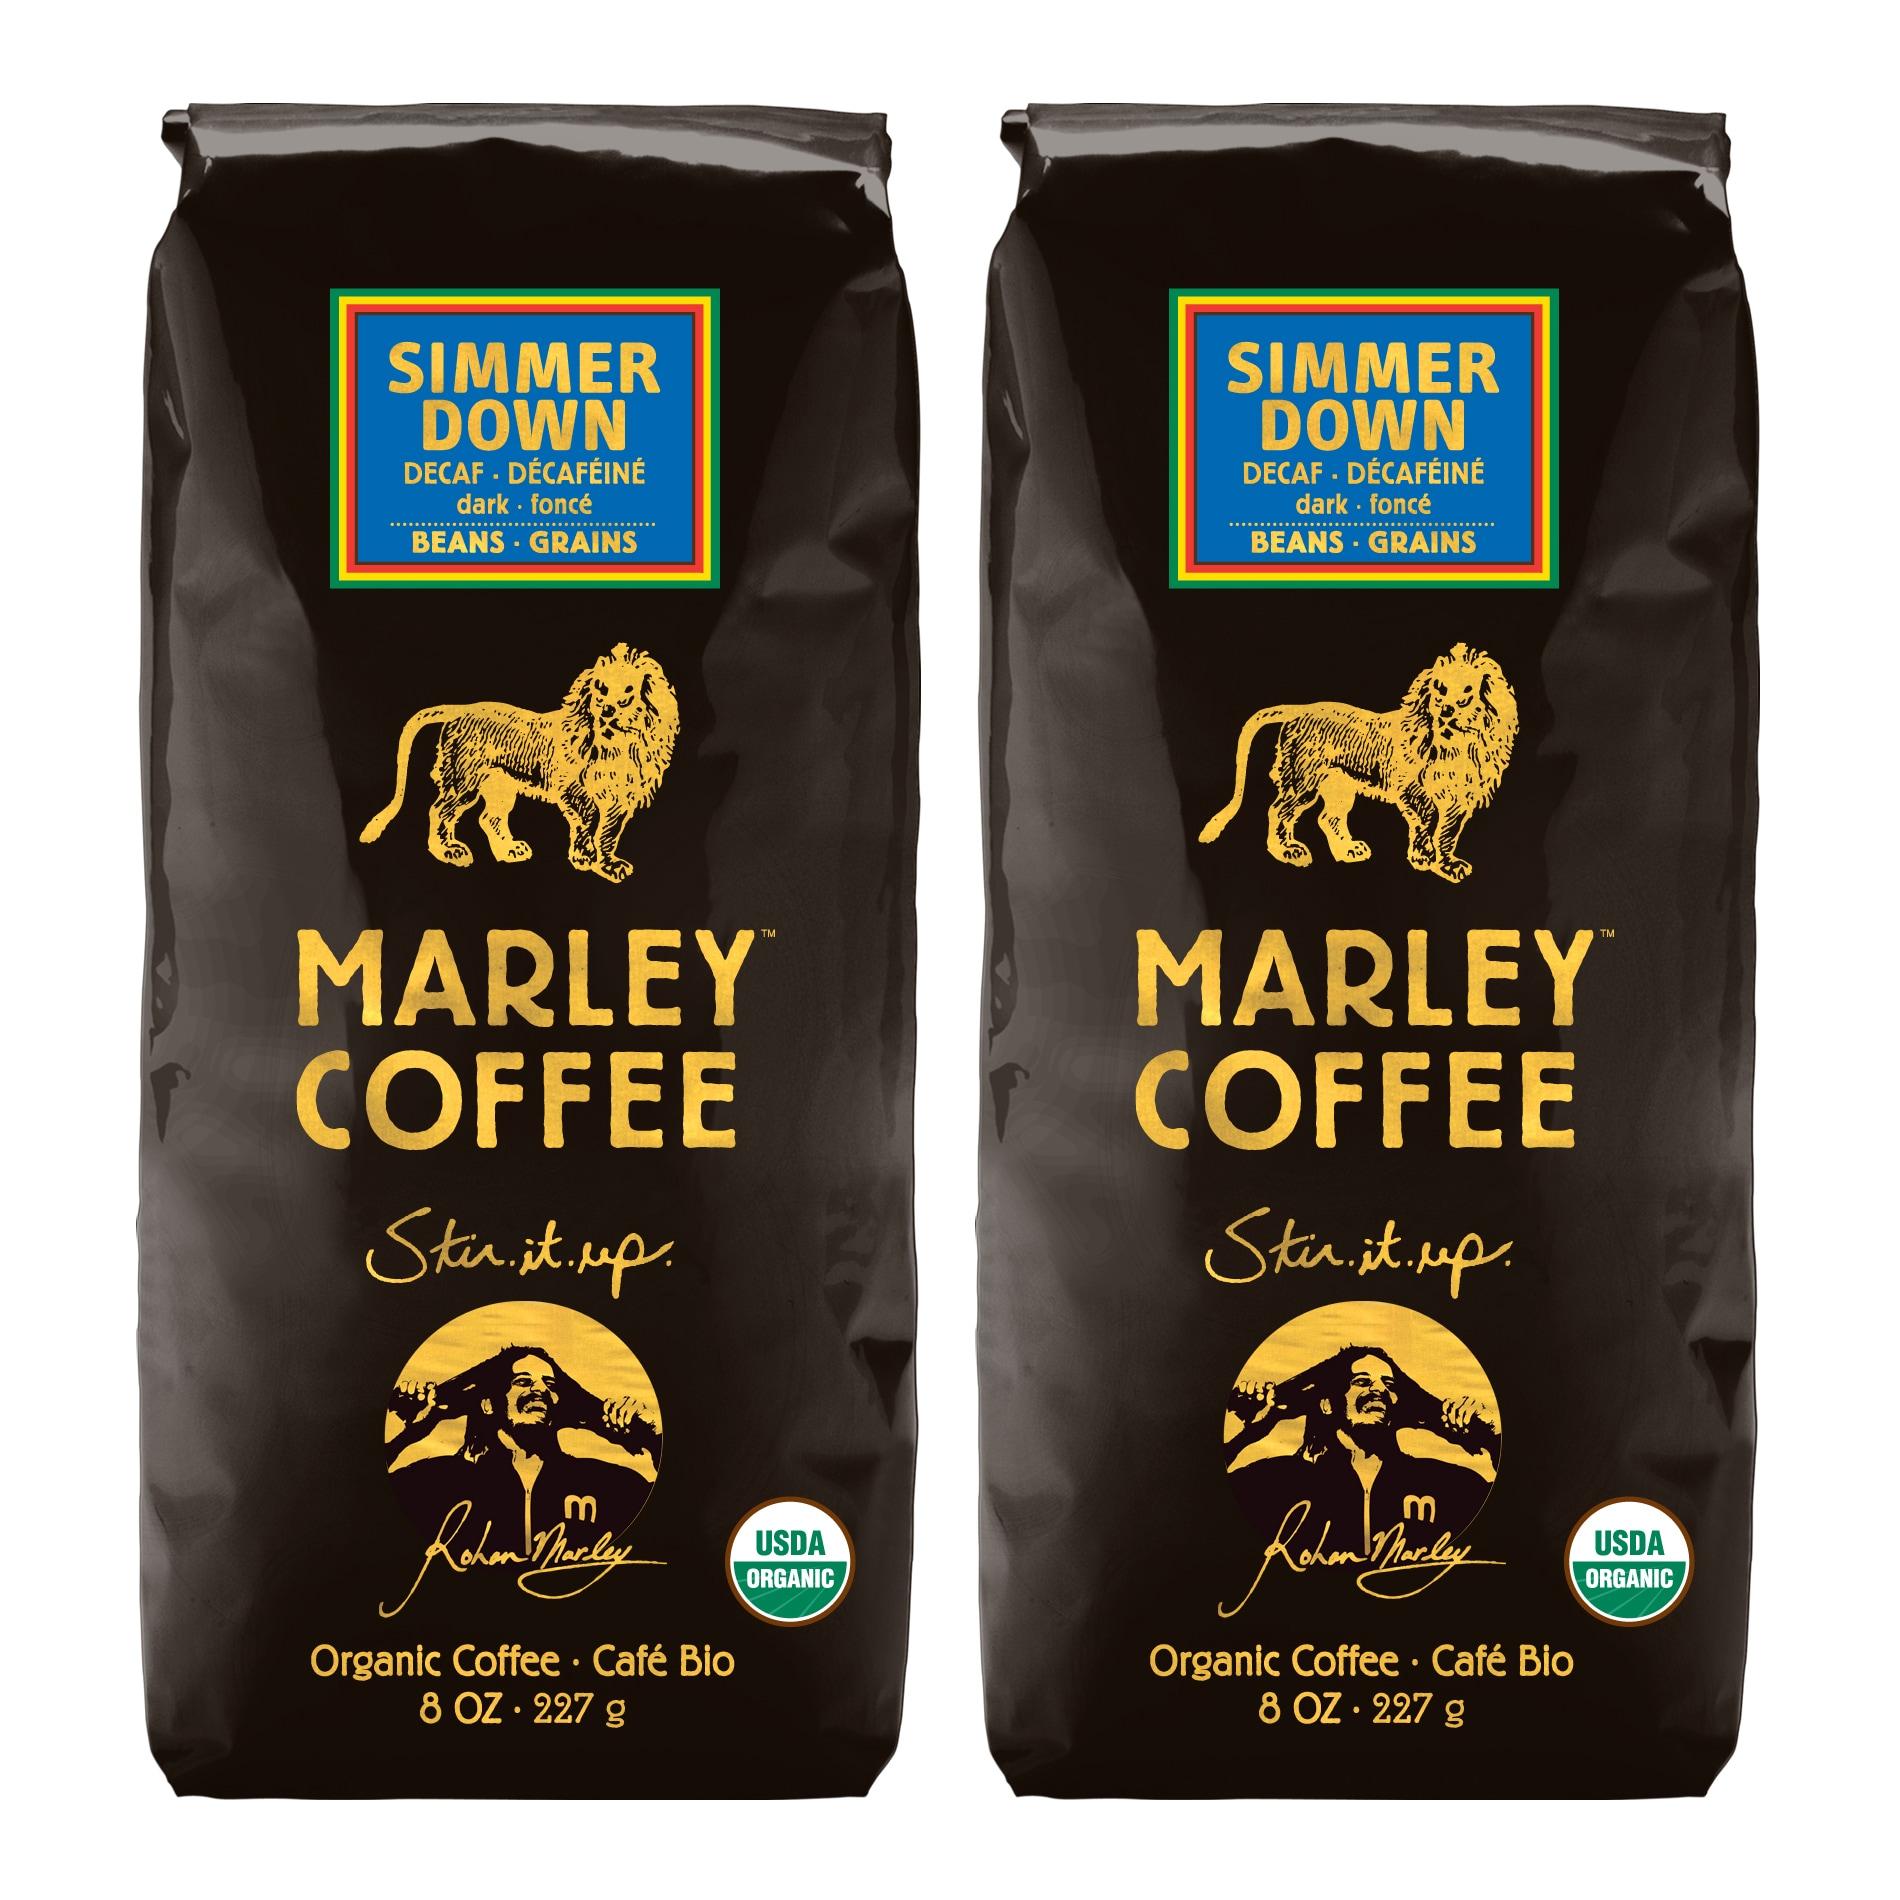 Marley Coffee Simmer Down Swiss Decaf Whole Bean Coffee (1 Pound)